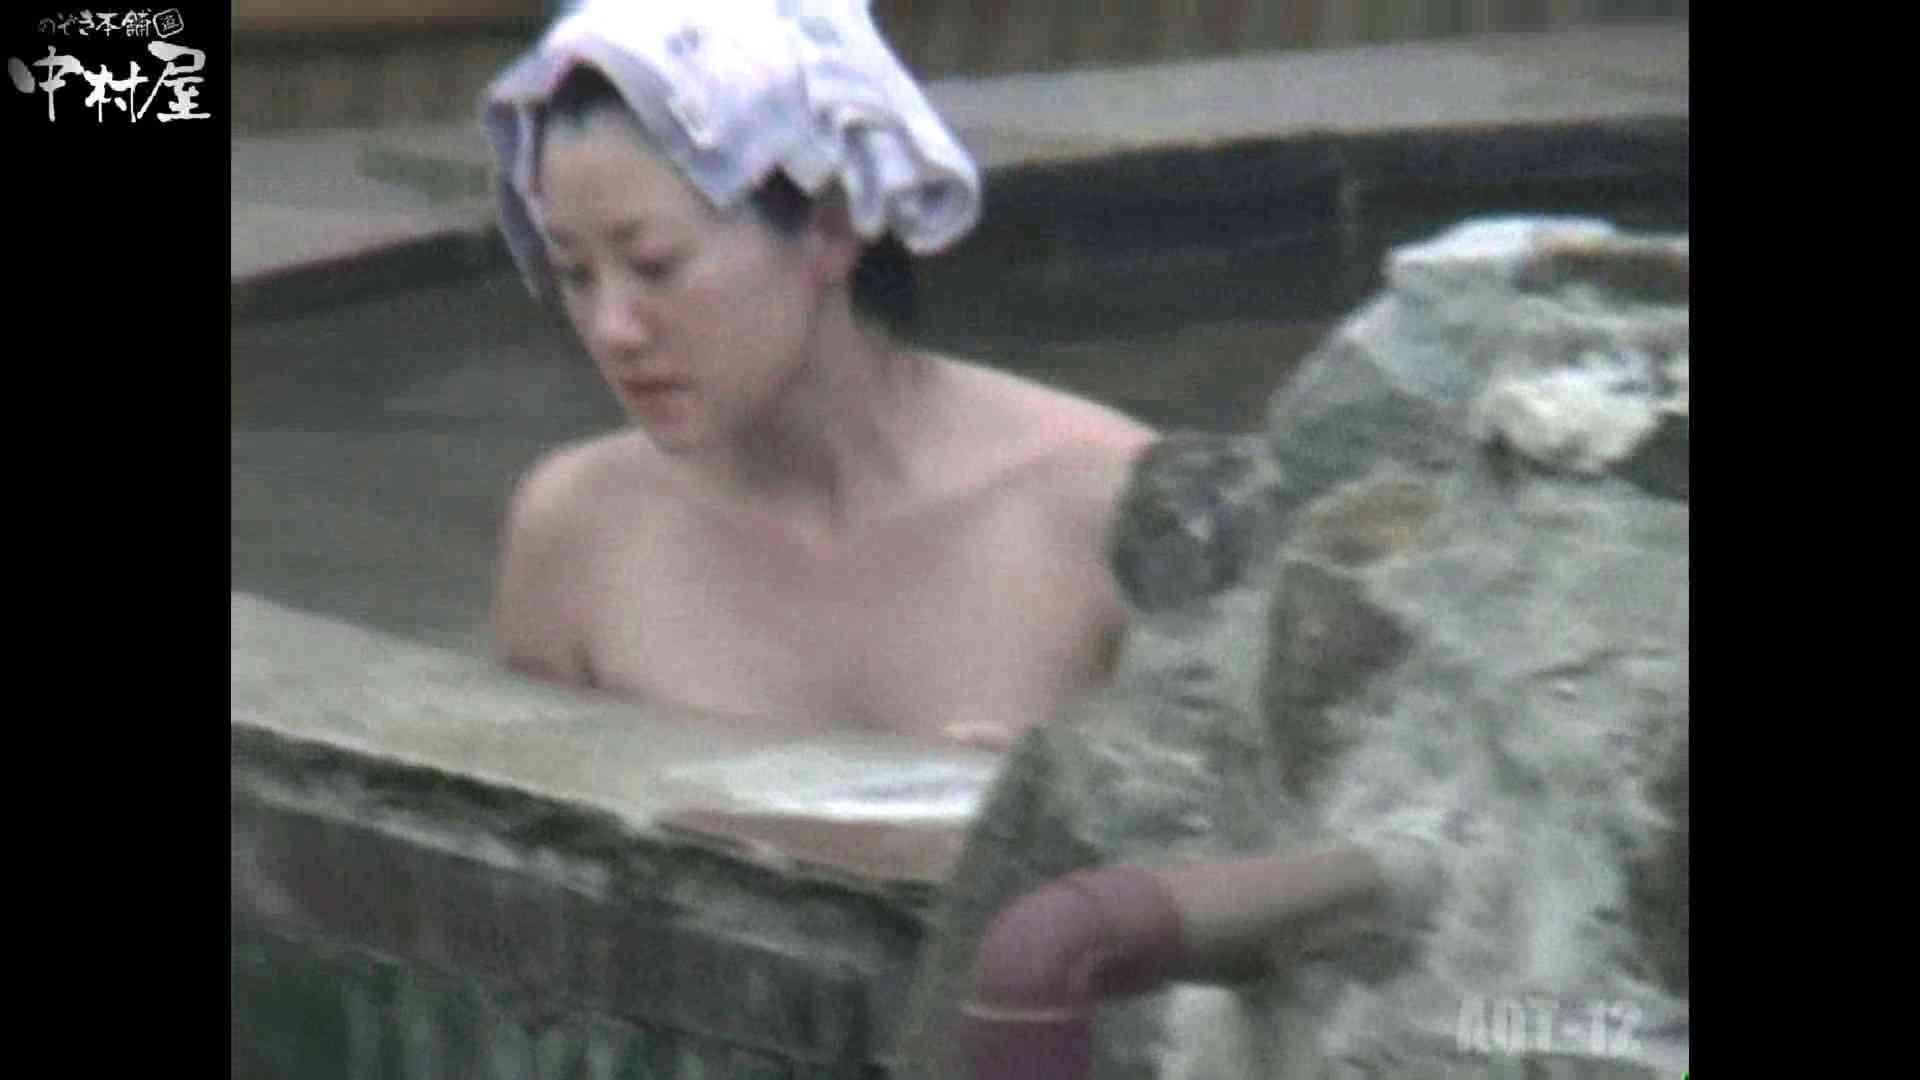 Aquaな露天風呂Vol.876潜入盗撮露天風呂十二判湯 其の三 盗撮師作品 | 美しいOLの裸体  88pic 33